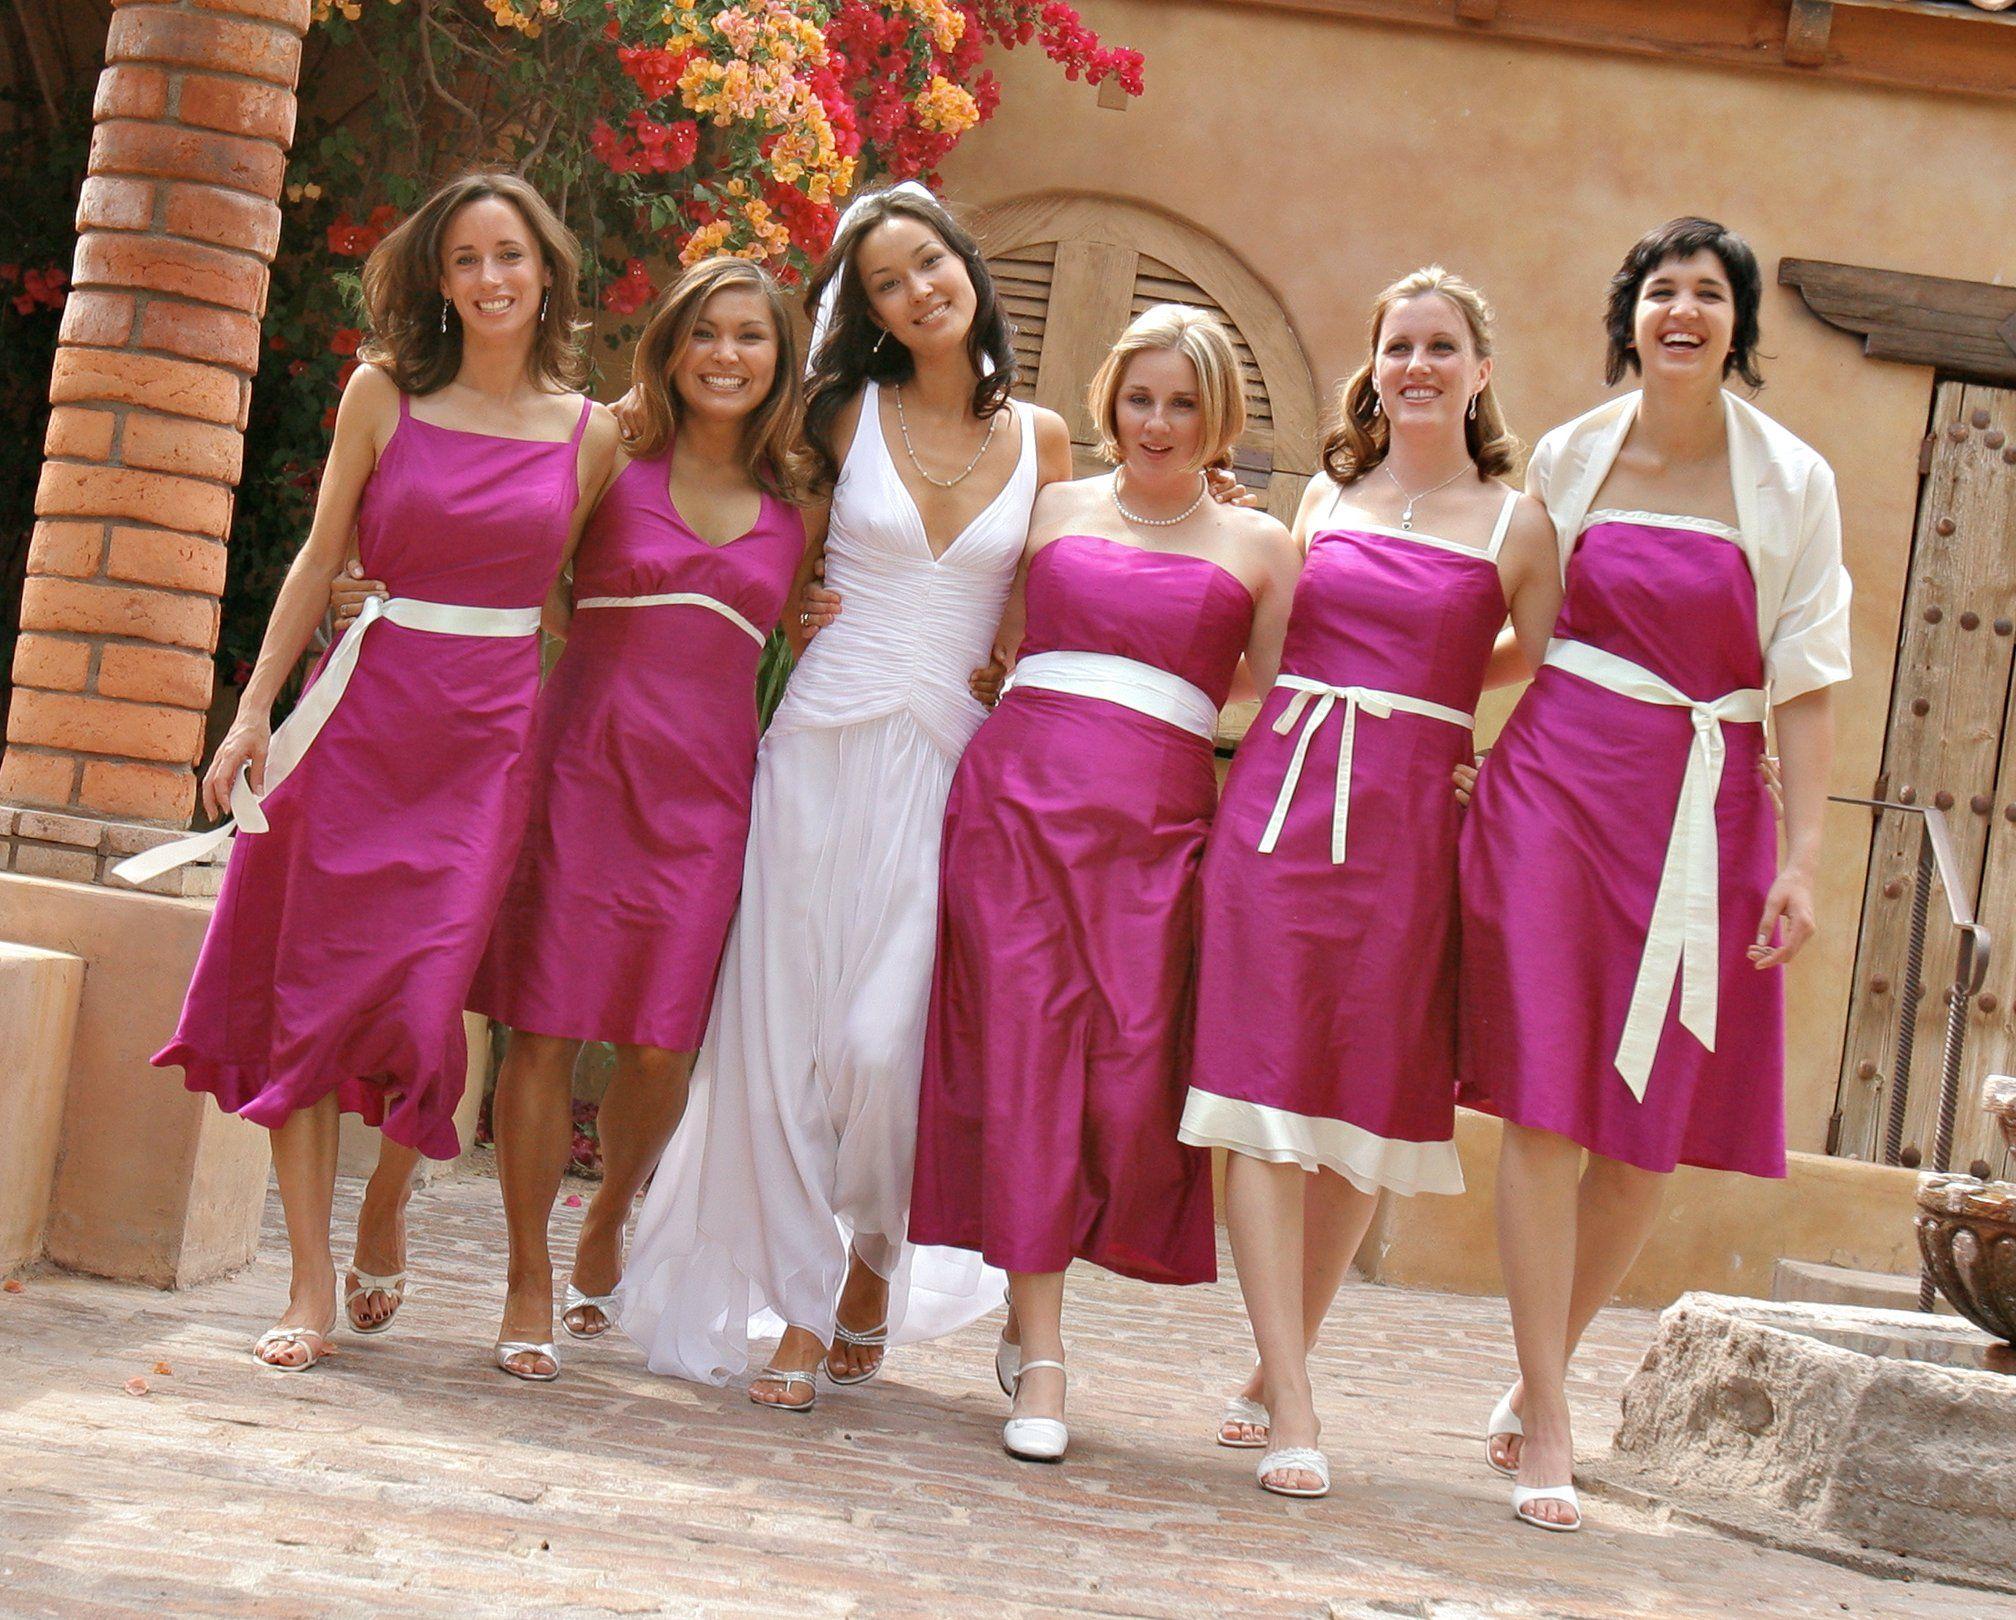 Wedding Bridesmaid Dresses | Moda | Pinterest